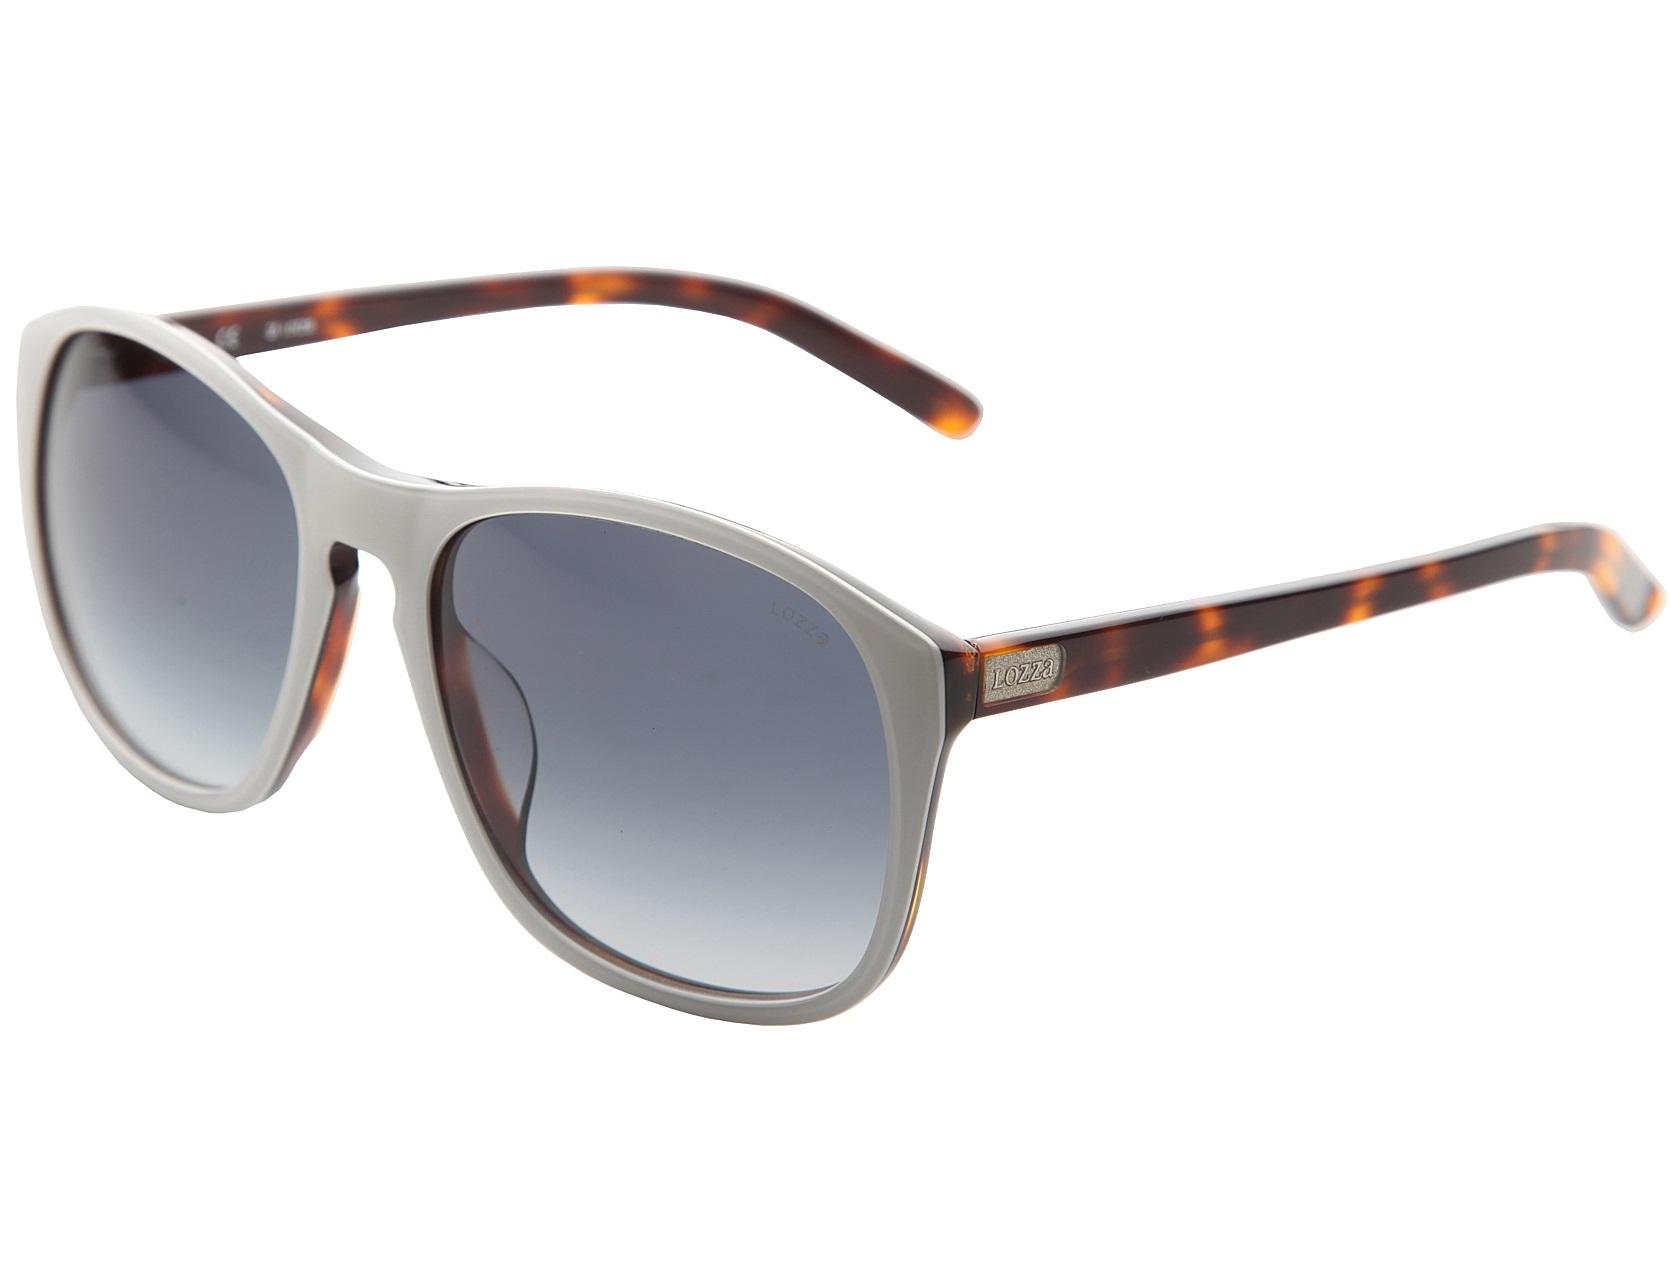 Sunglasses Lozza SL1845V 550AD7 Rf600287